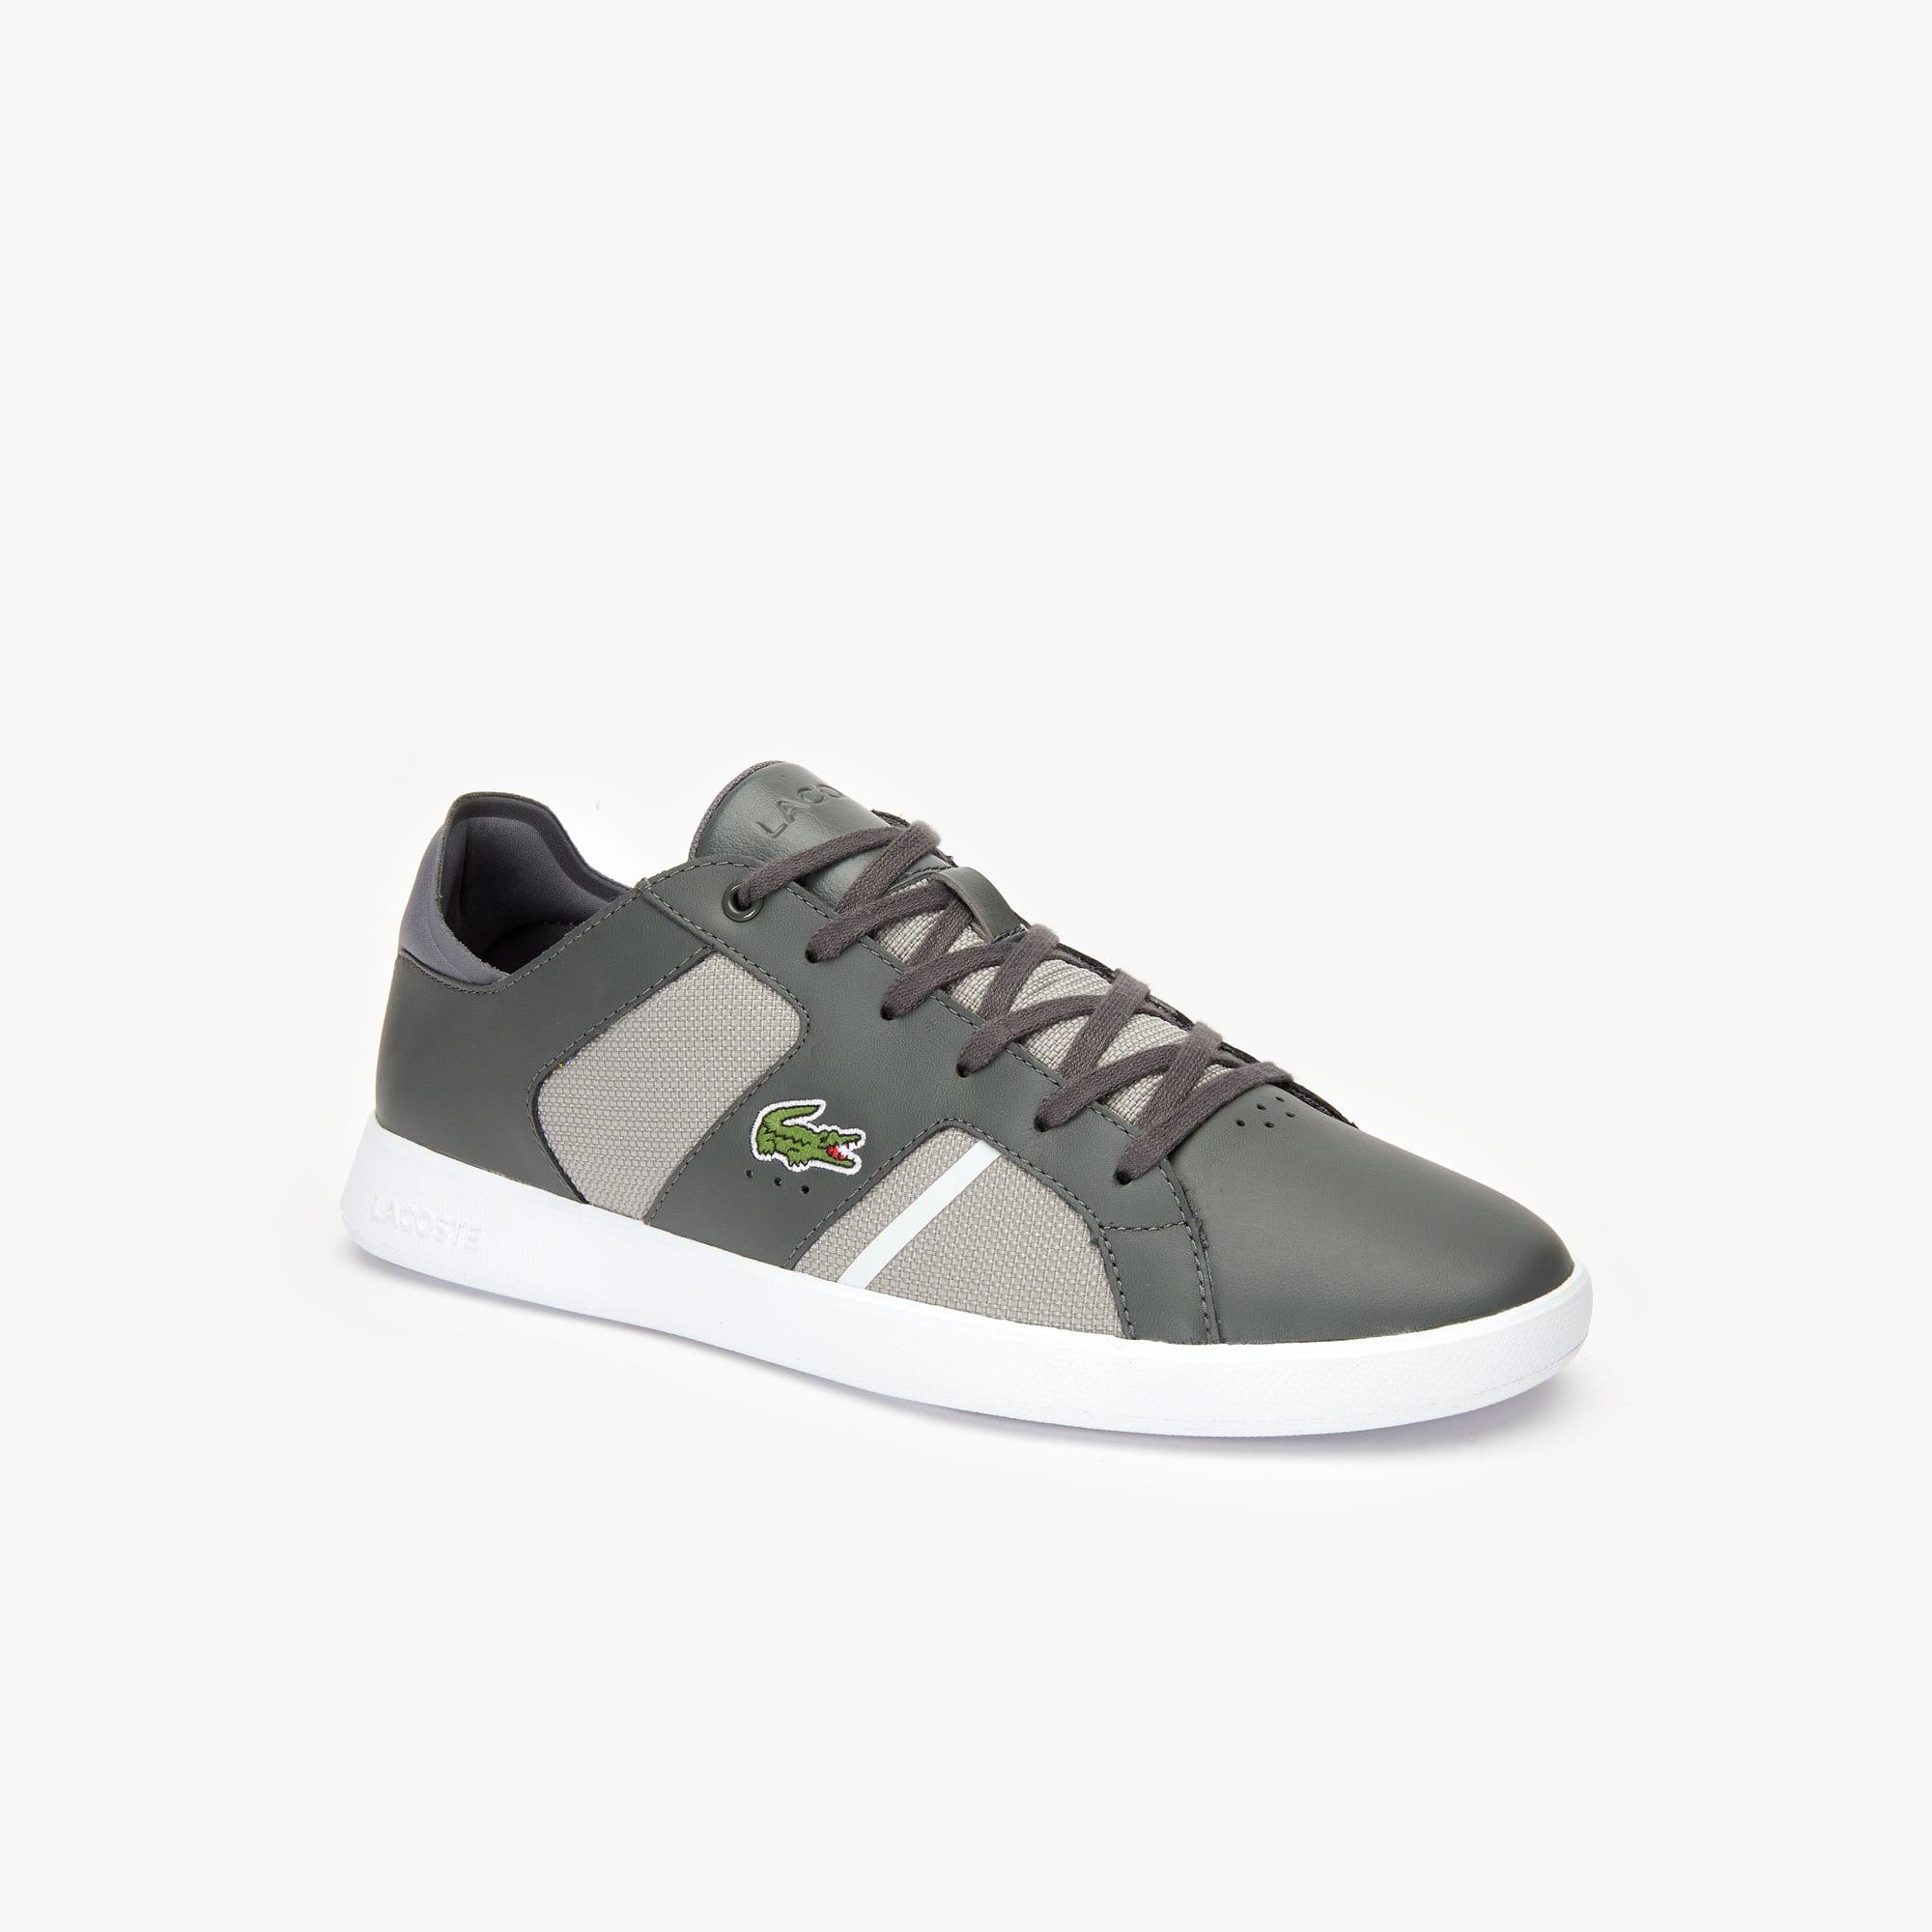 Lacoste Sneakers Men's Novas Leather-Paneled Sneakers